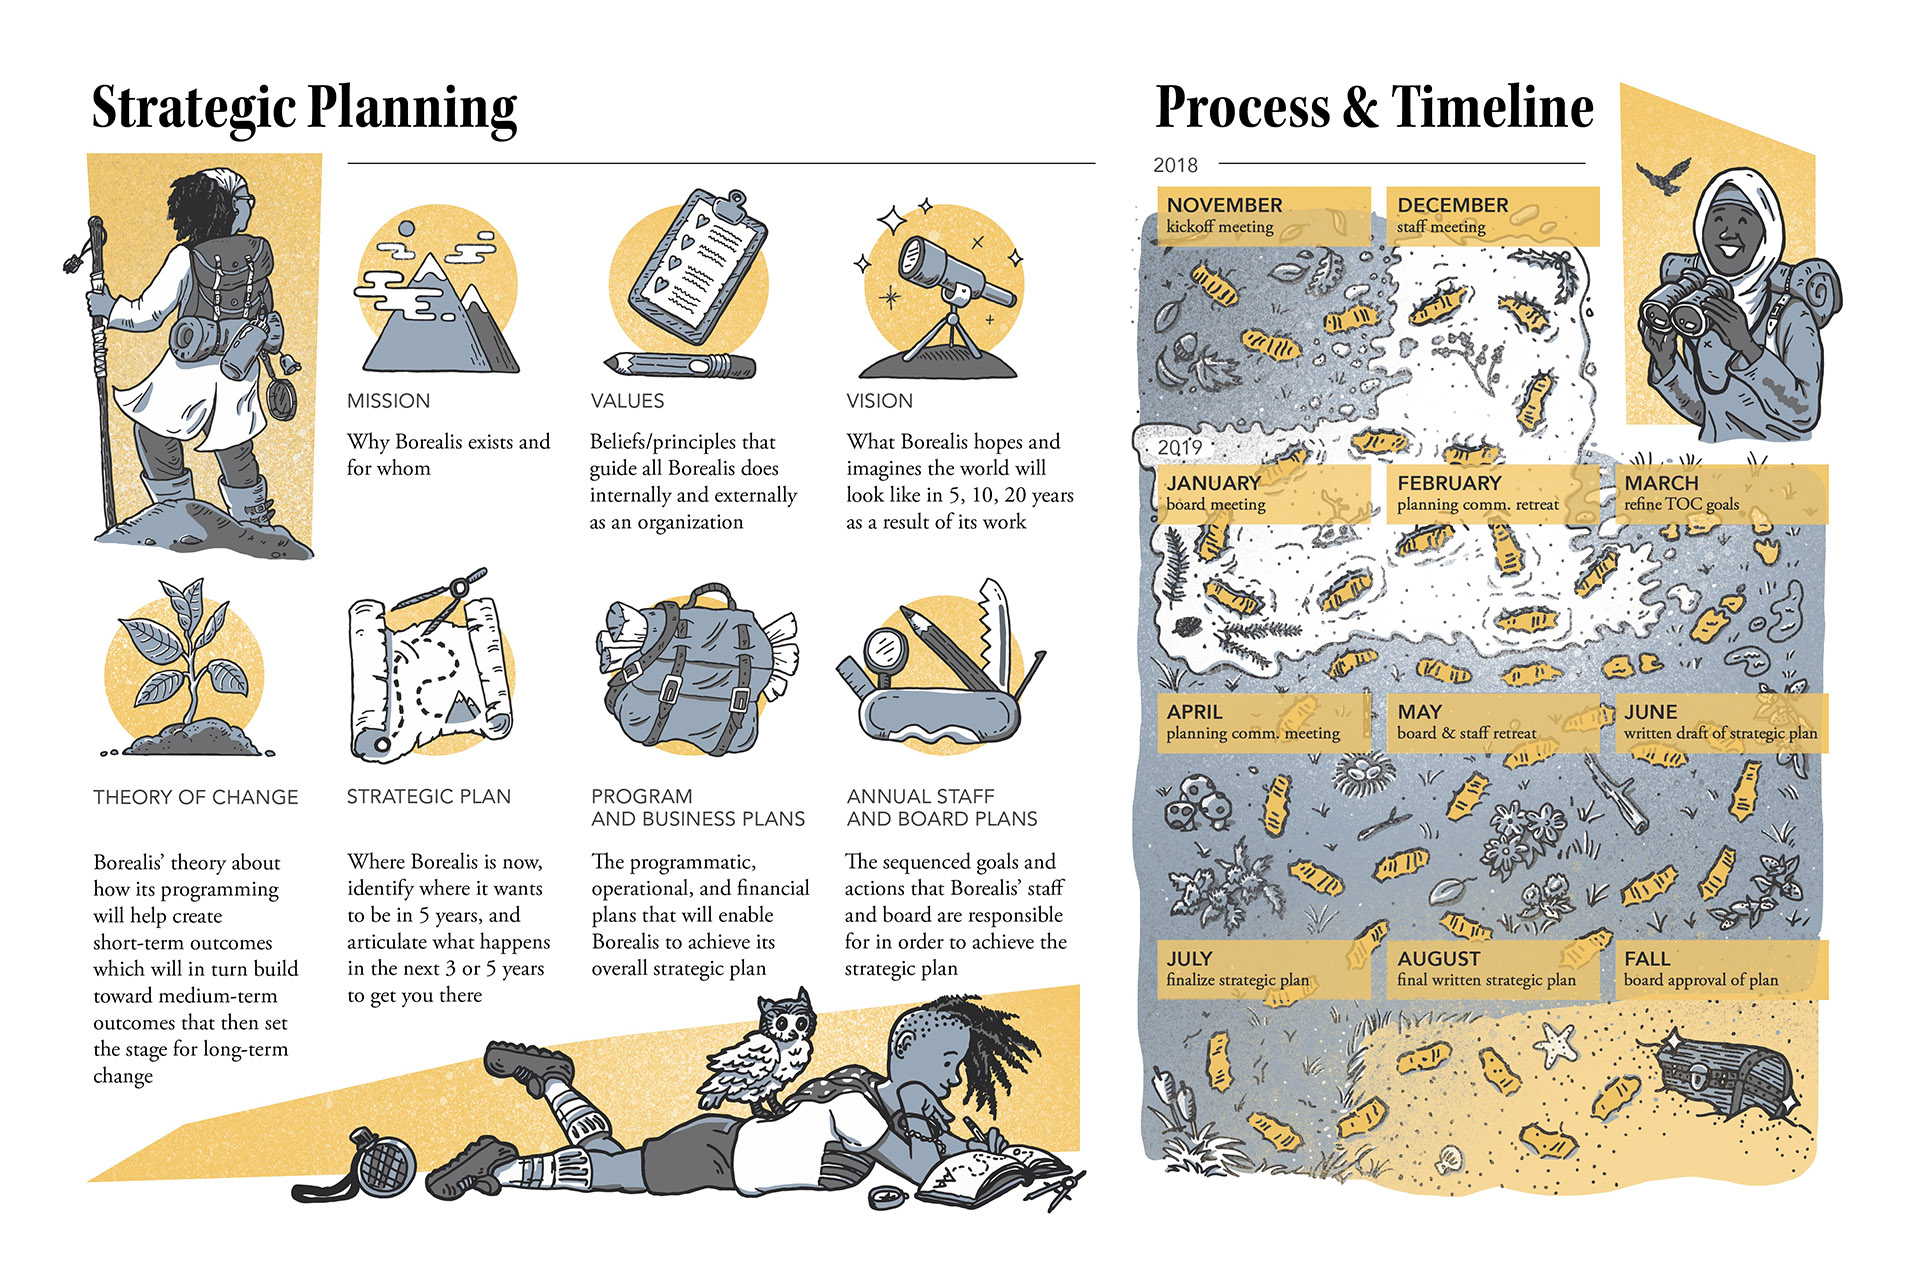 Taylor-Baldry-CLA-StrategicPlanning-Illustration-2.jpg